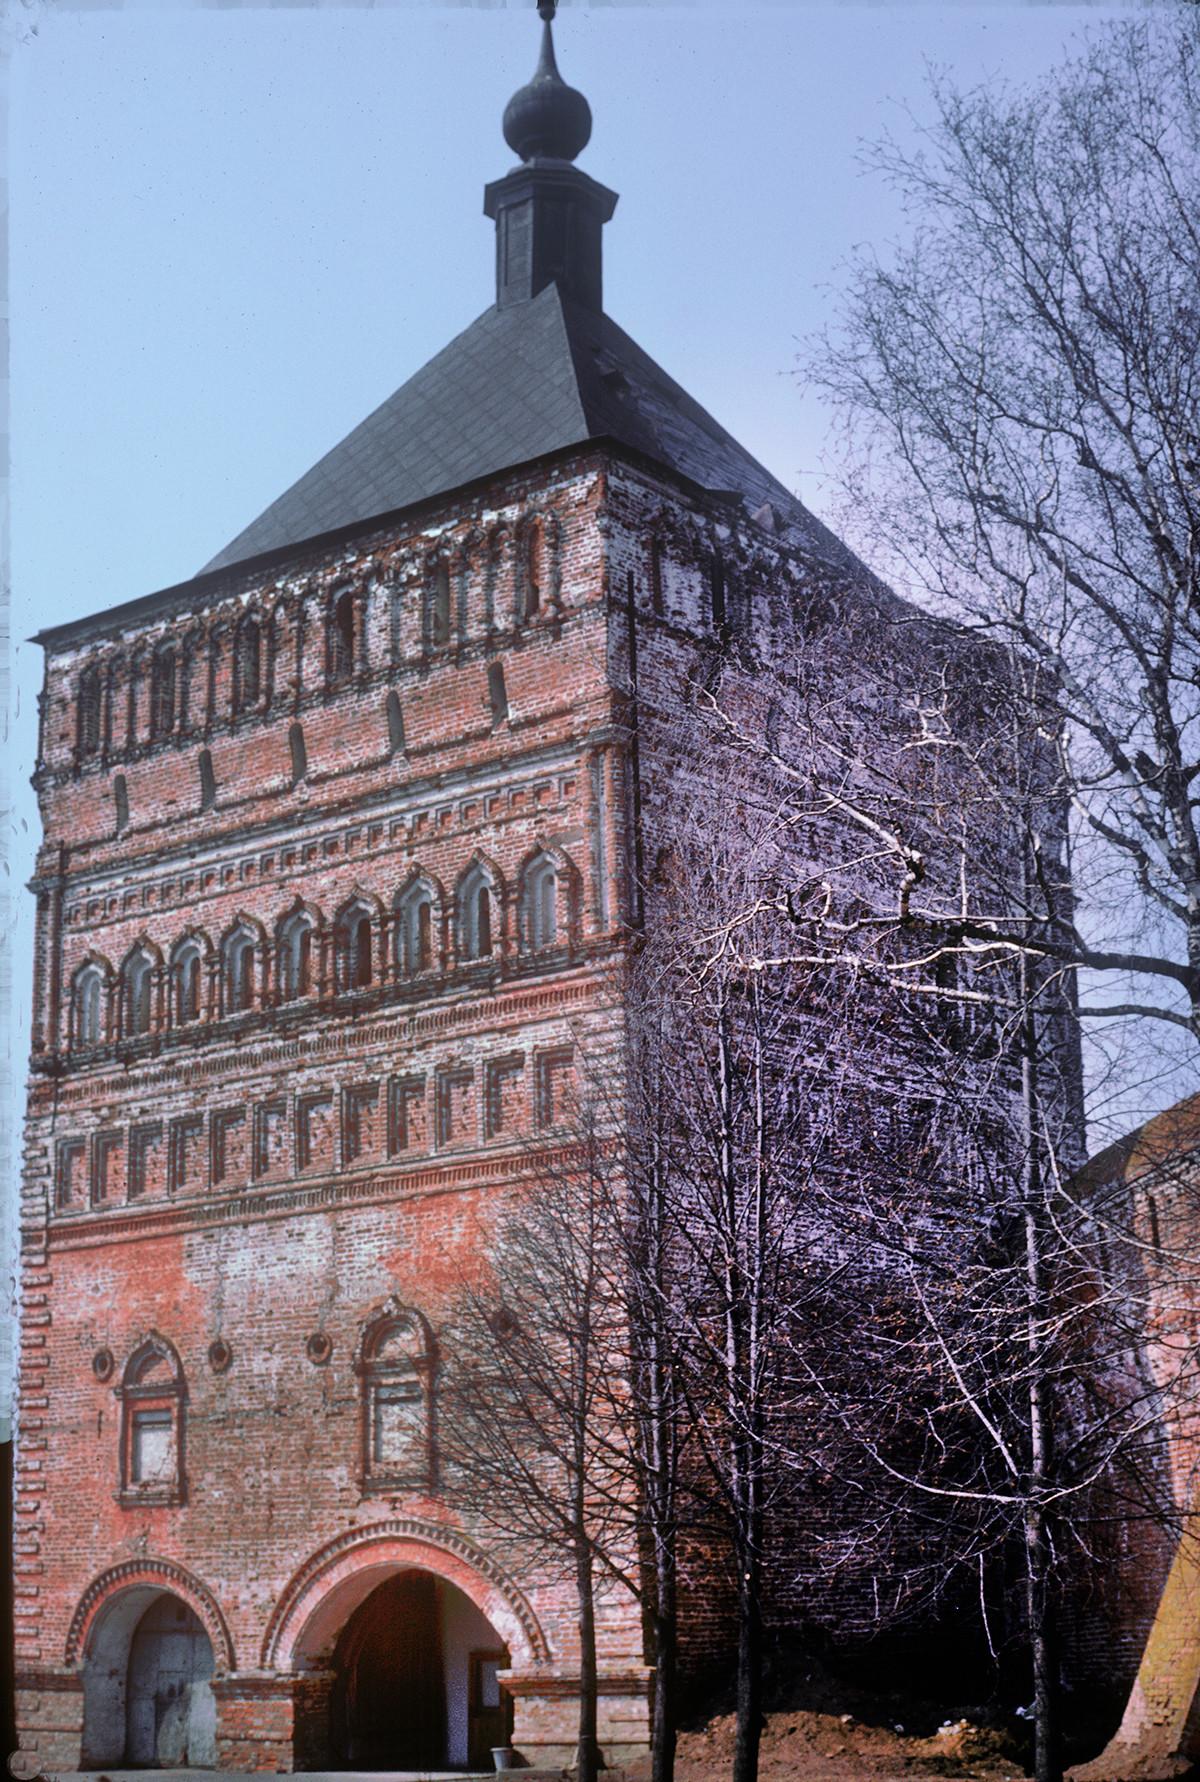 Savior-St. Evfimy Monastery, main entrance tower. April 27, 1980